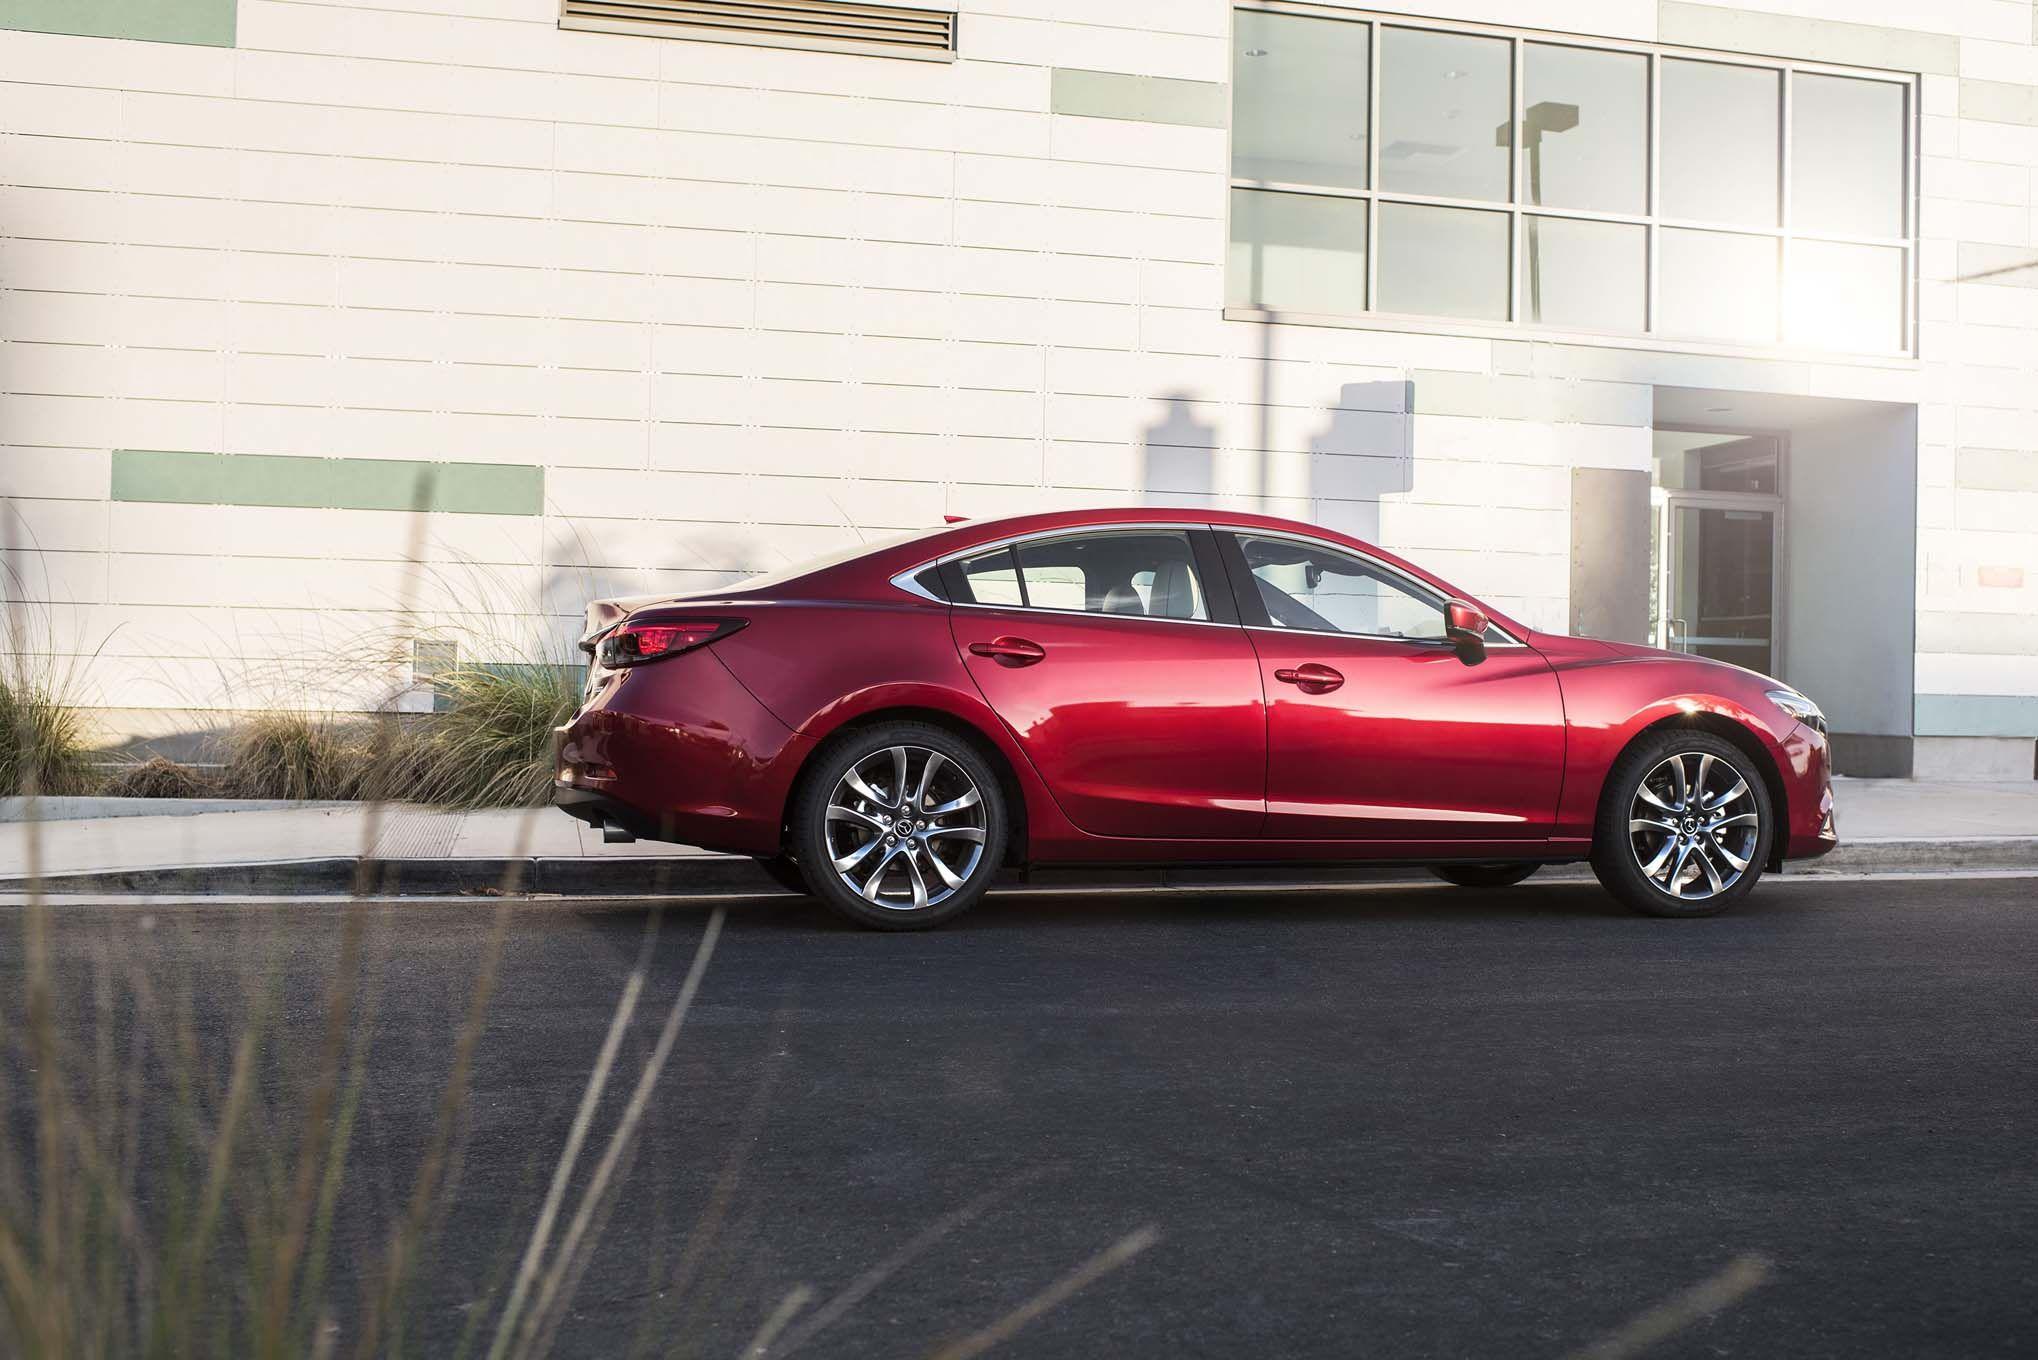 2018 Mazda 6 Coupe Wagon Turbo 2018 CARS RELEASE 2019